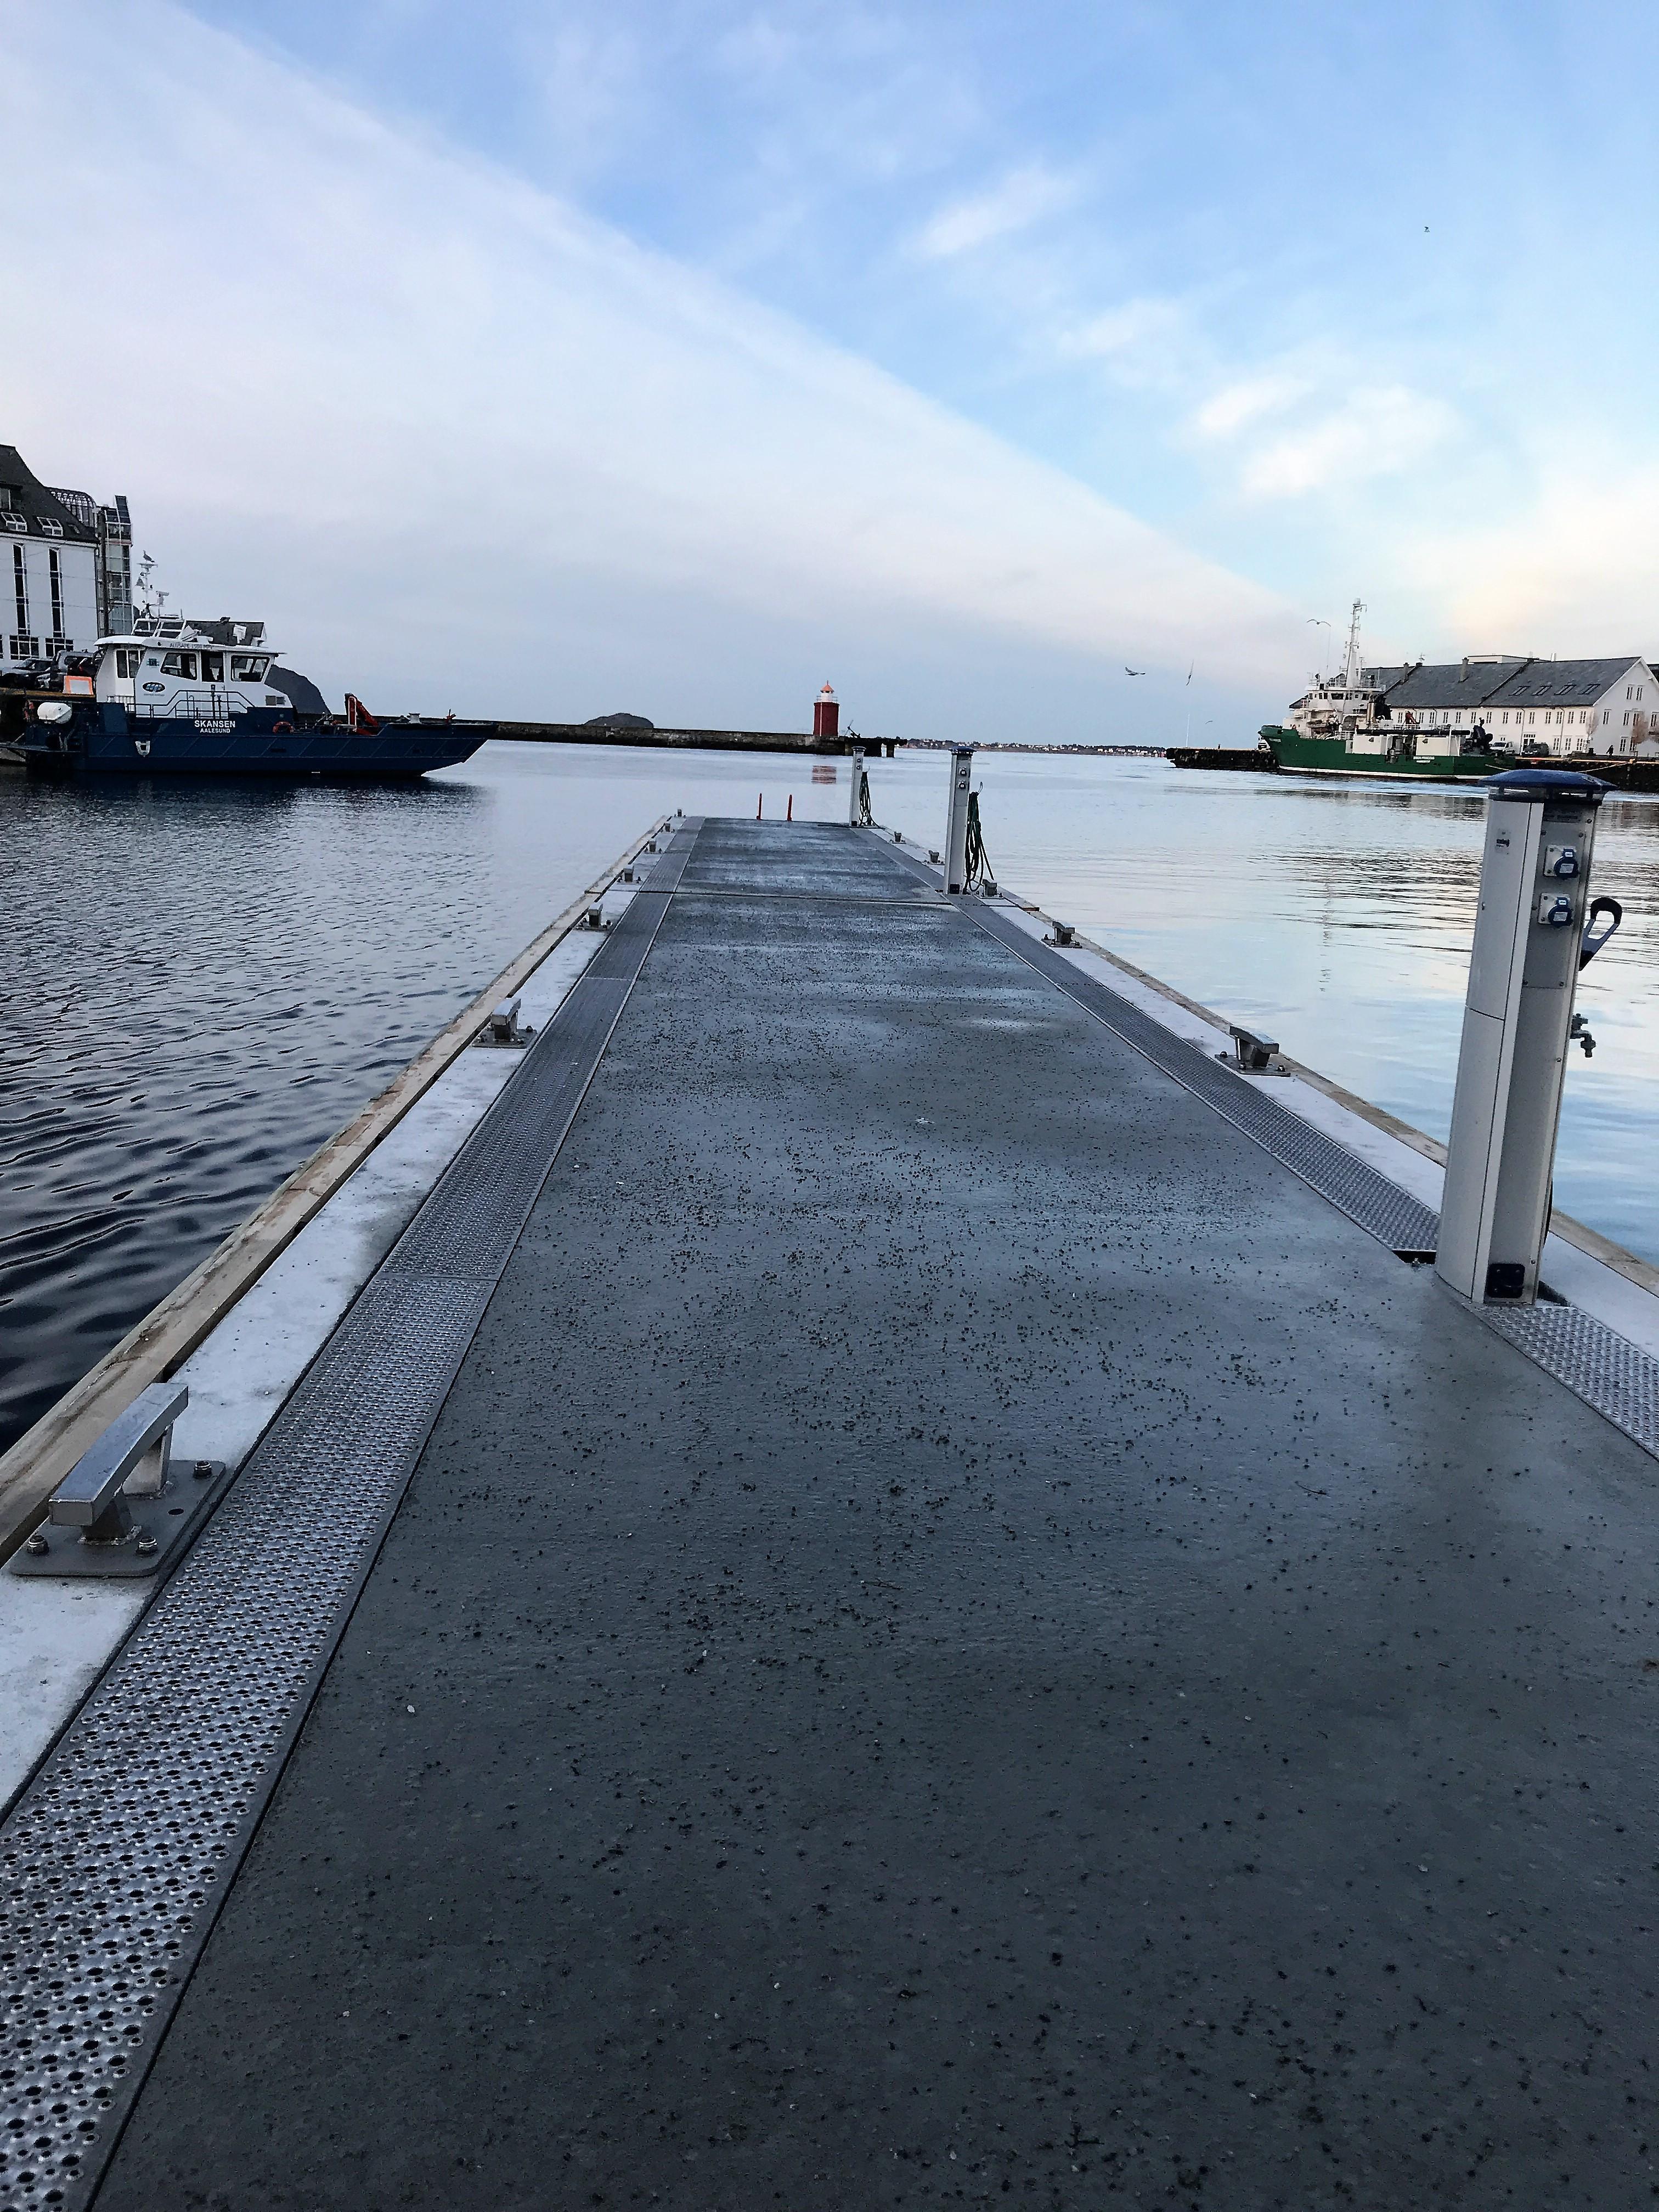 https://www.marinasolutions.no/uploads/rennebrygge-ålesund-skateflukaia-marina-solutions.JPG